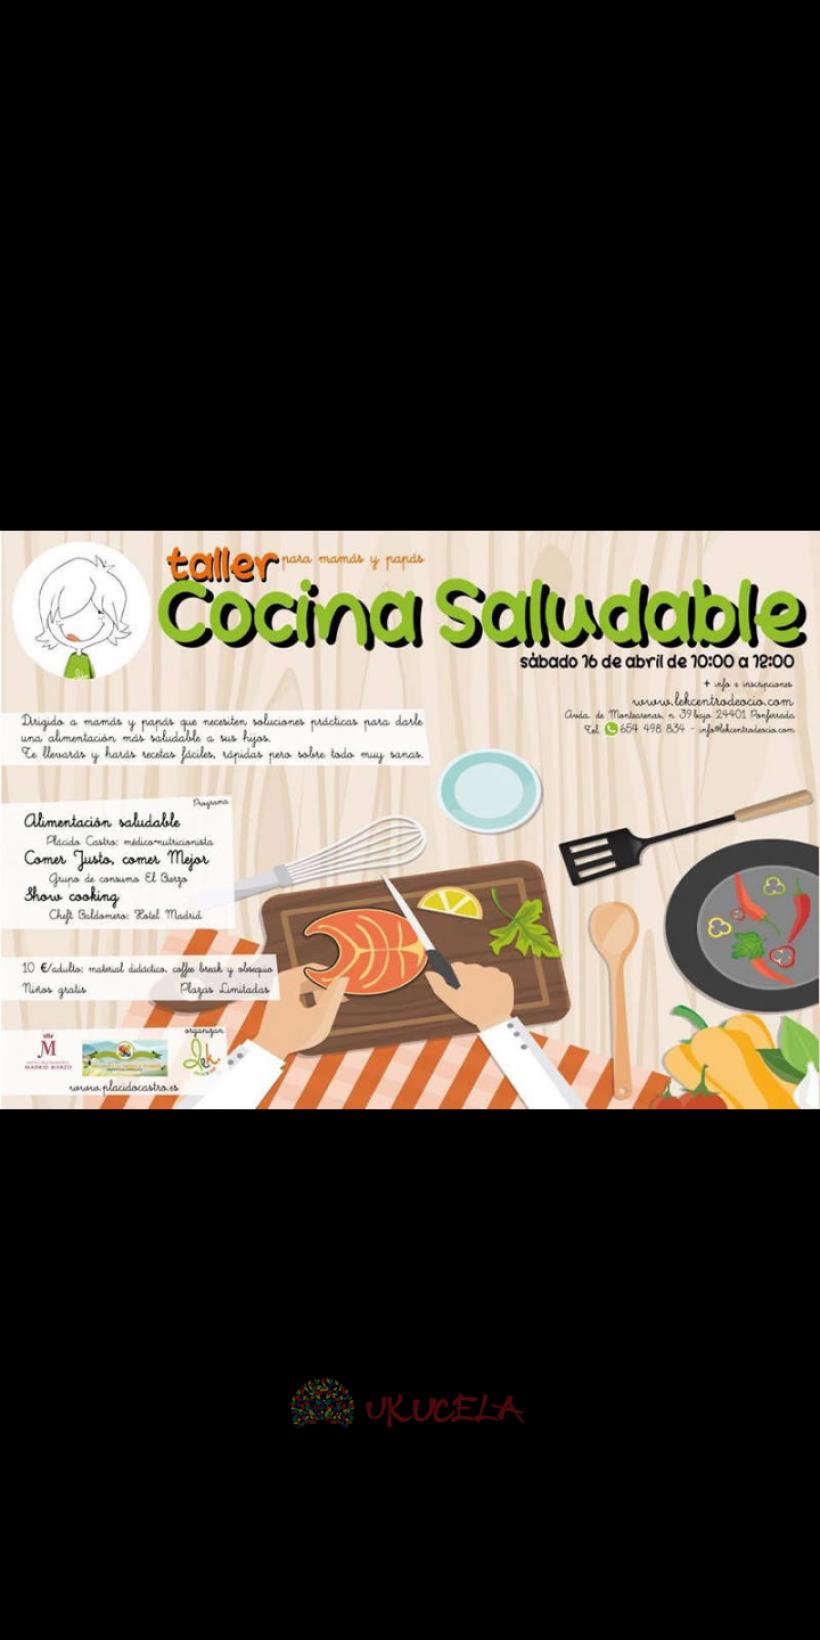 Taller de cocina saludable Alta cocina Gratis